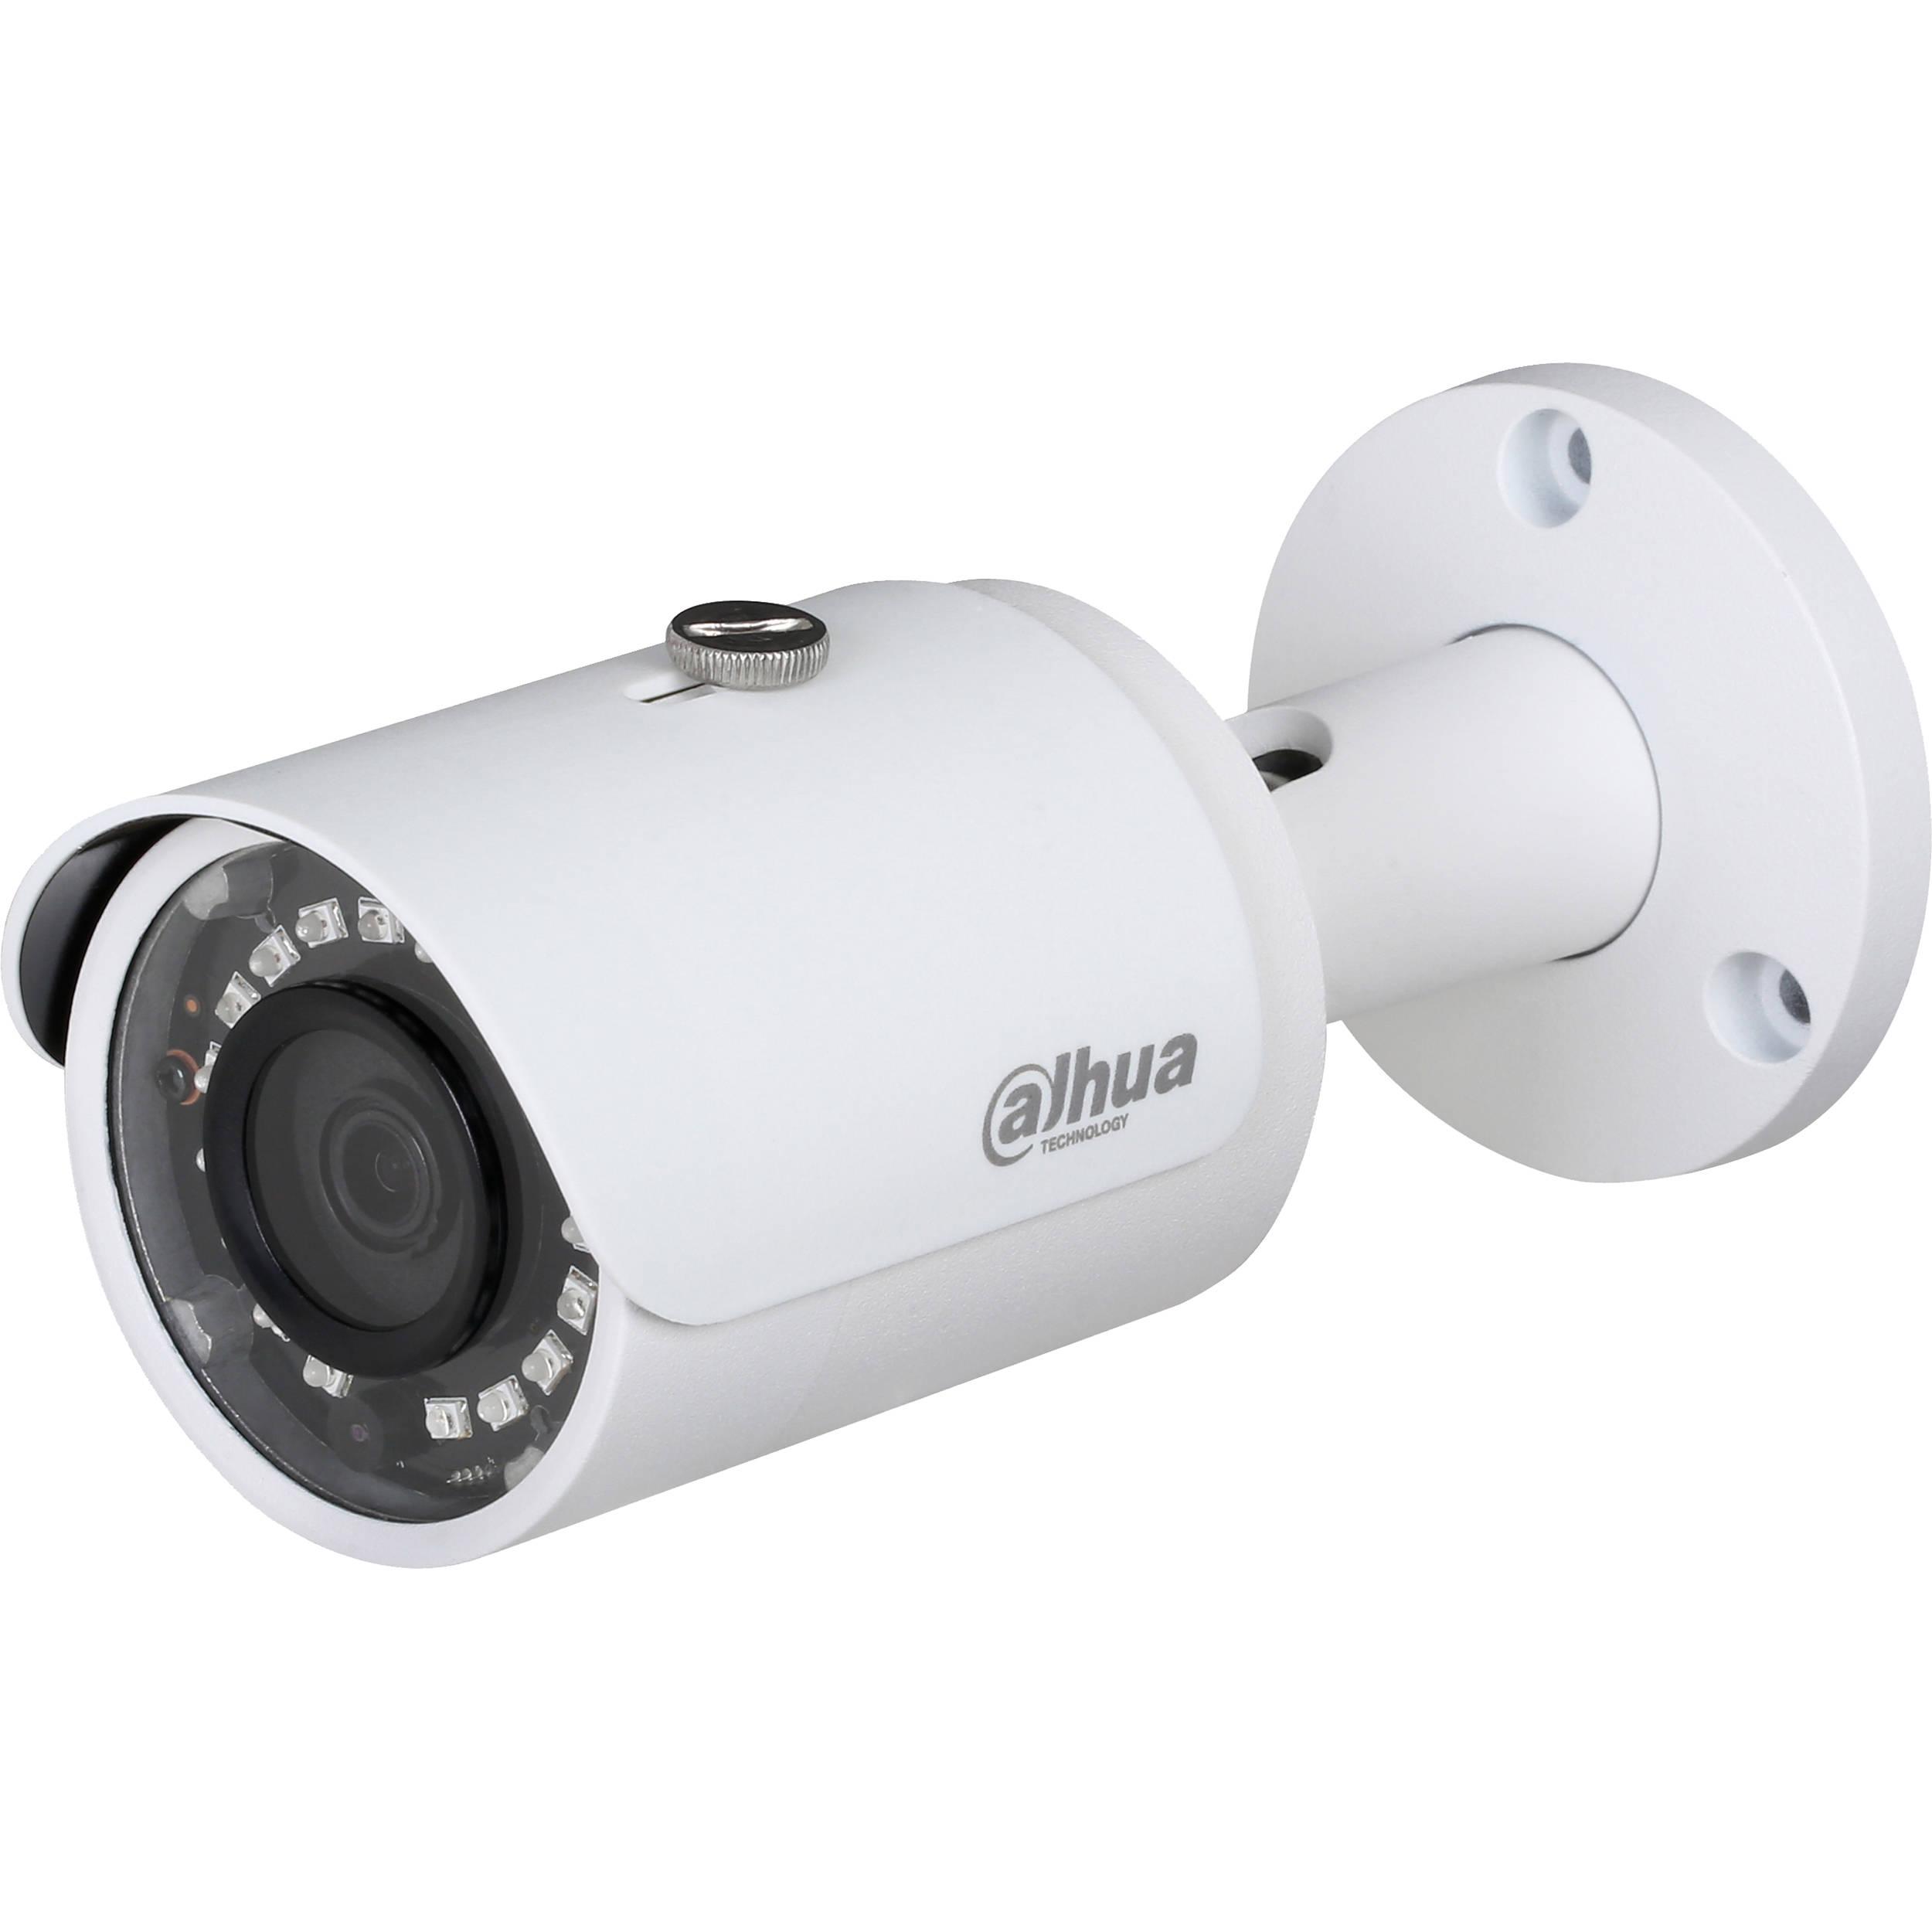 Dahua Technology Pro Series N51BD22 5MP Outdoor Network N51BD22